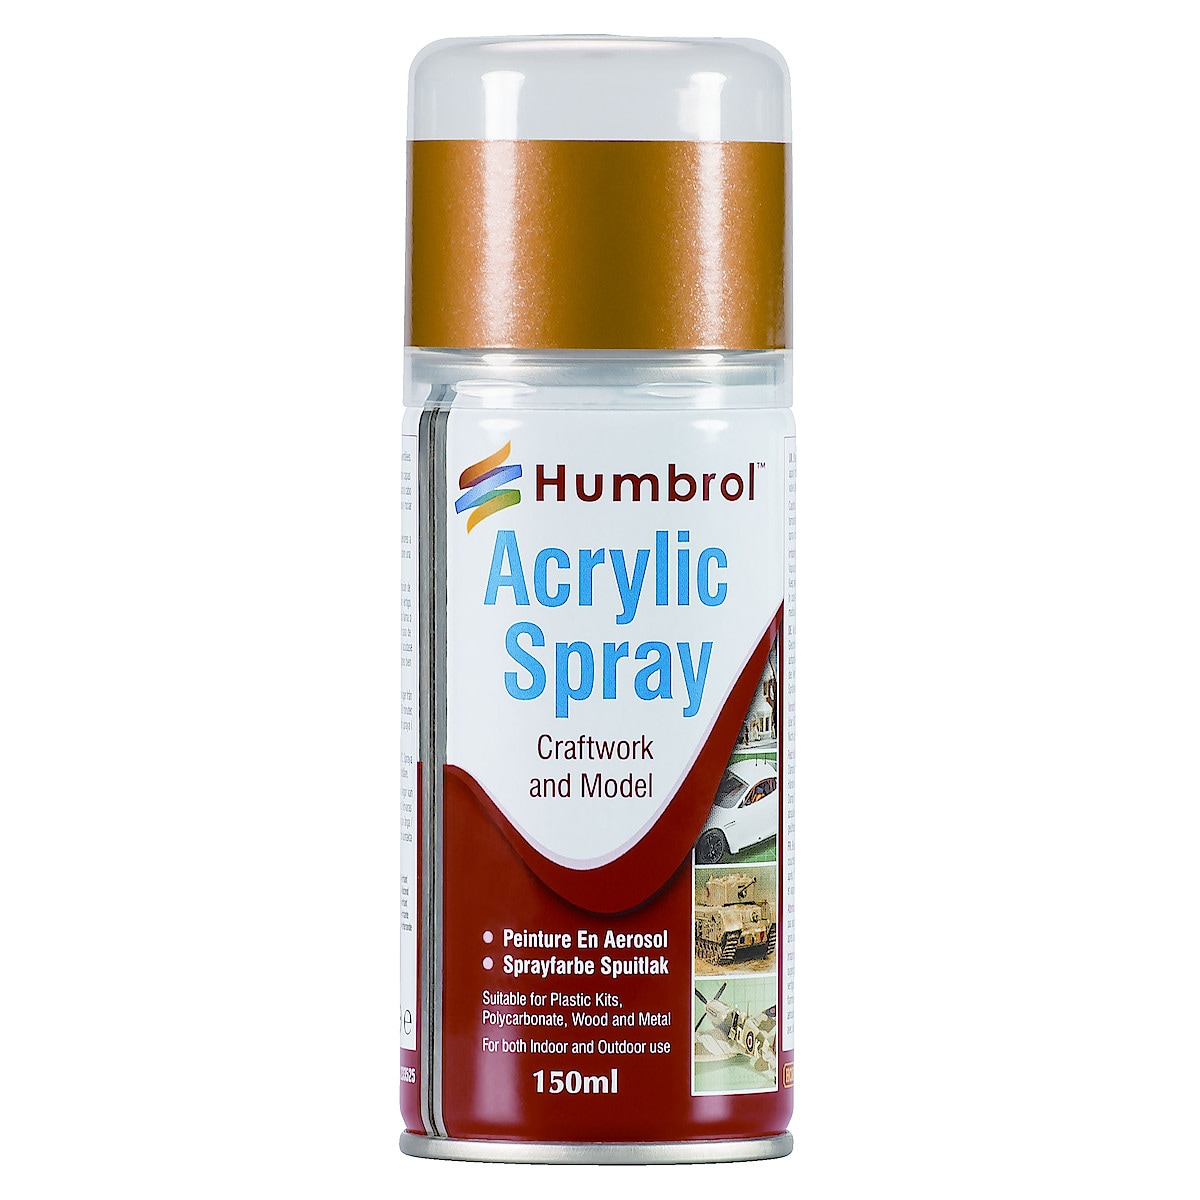 Akrylspray Humbrol mässing